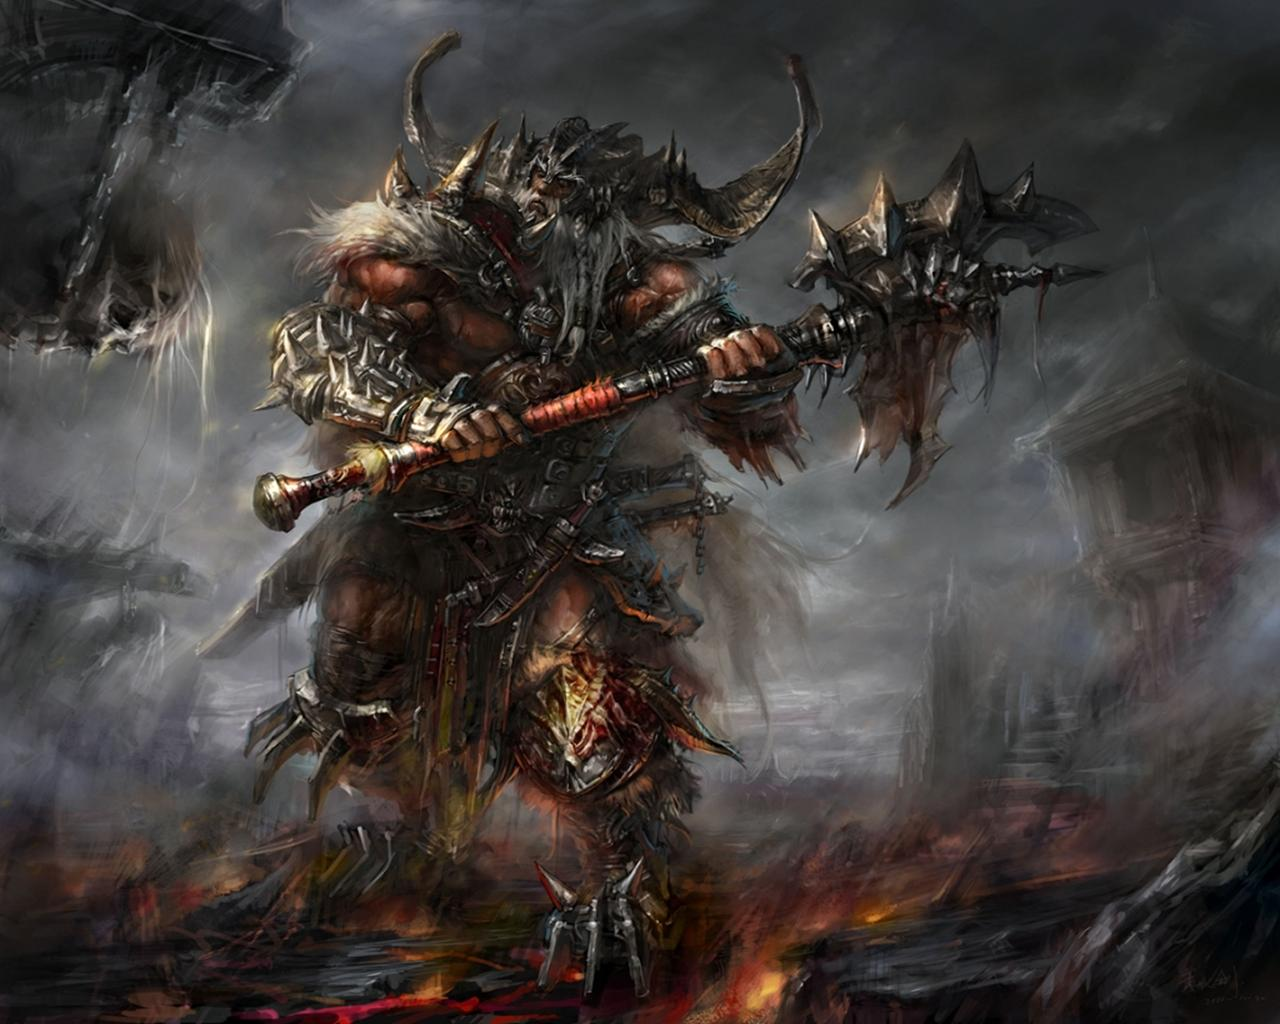 Diablo 3 Ros Wallpaper: D3 Wallpapers HD